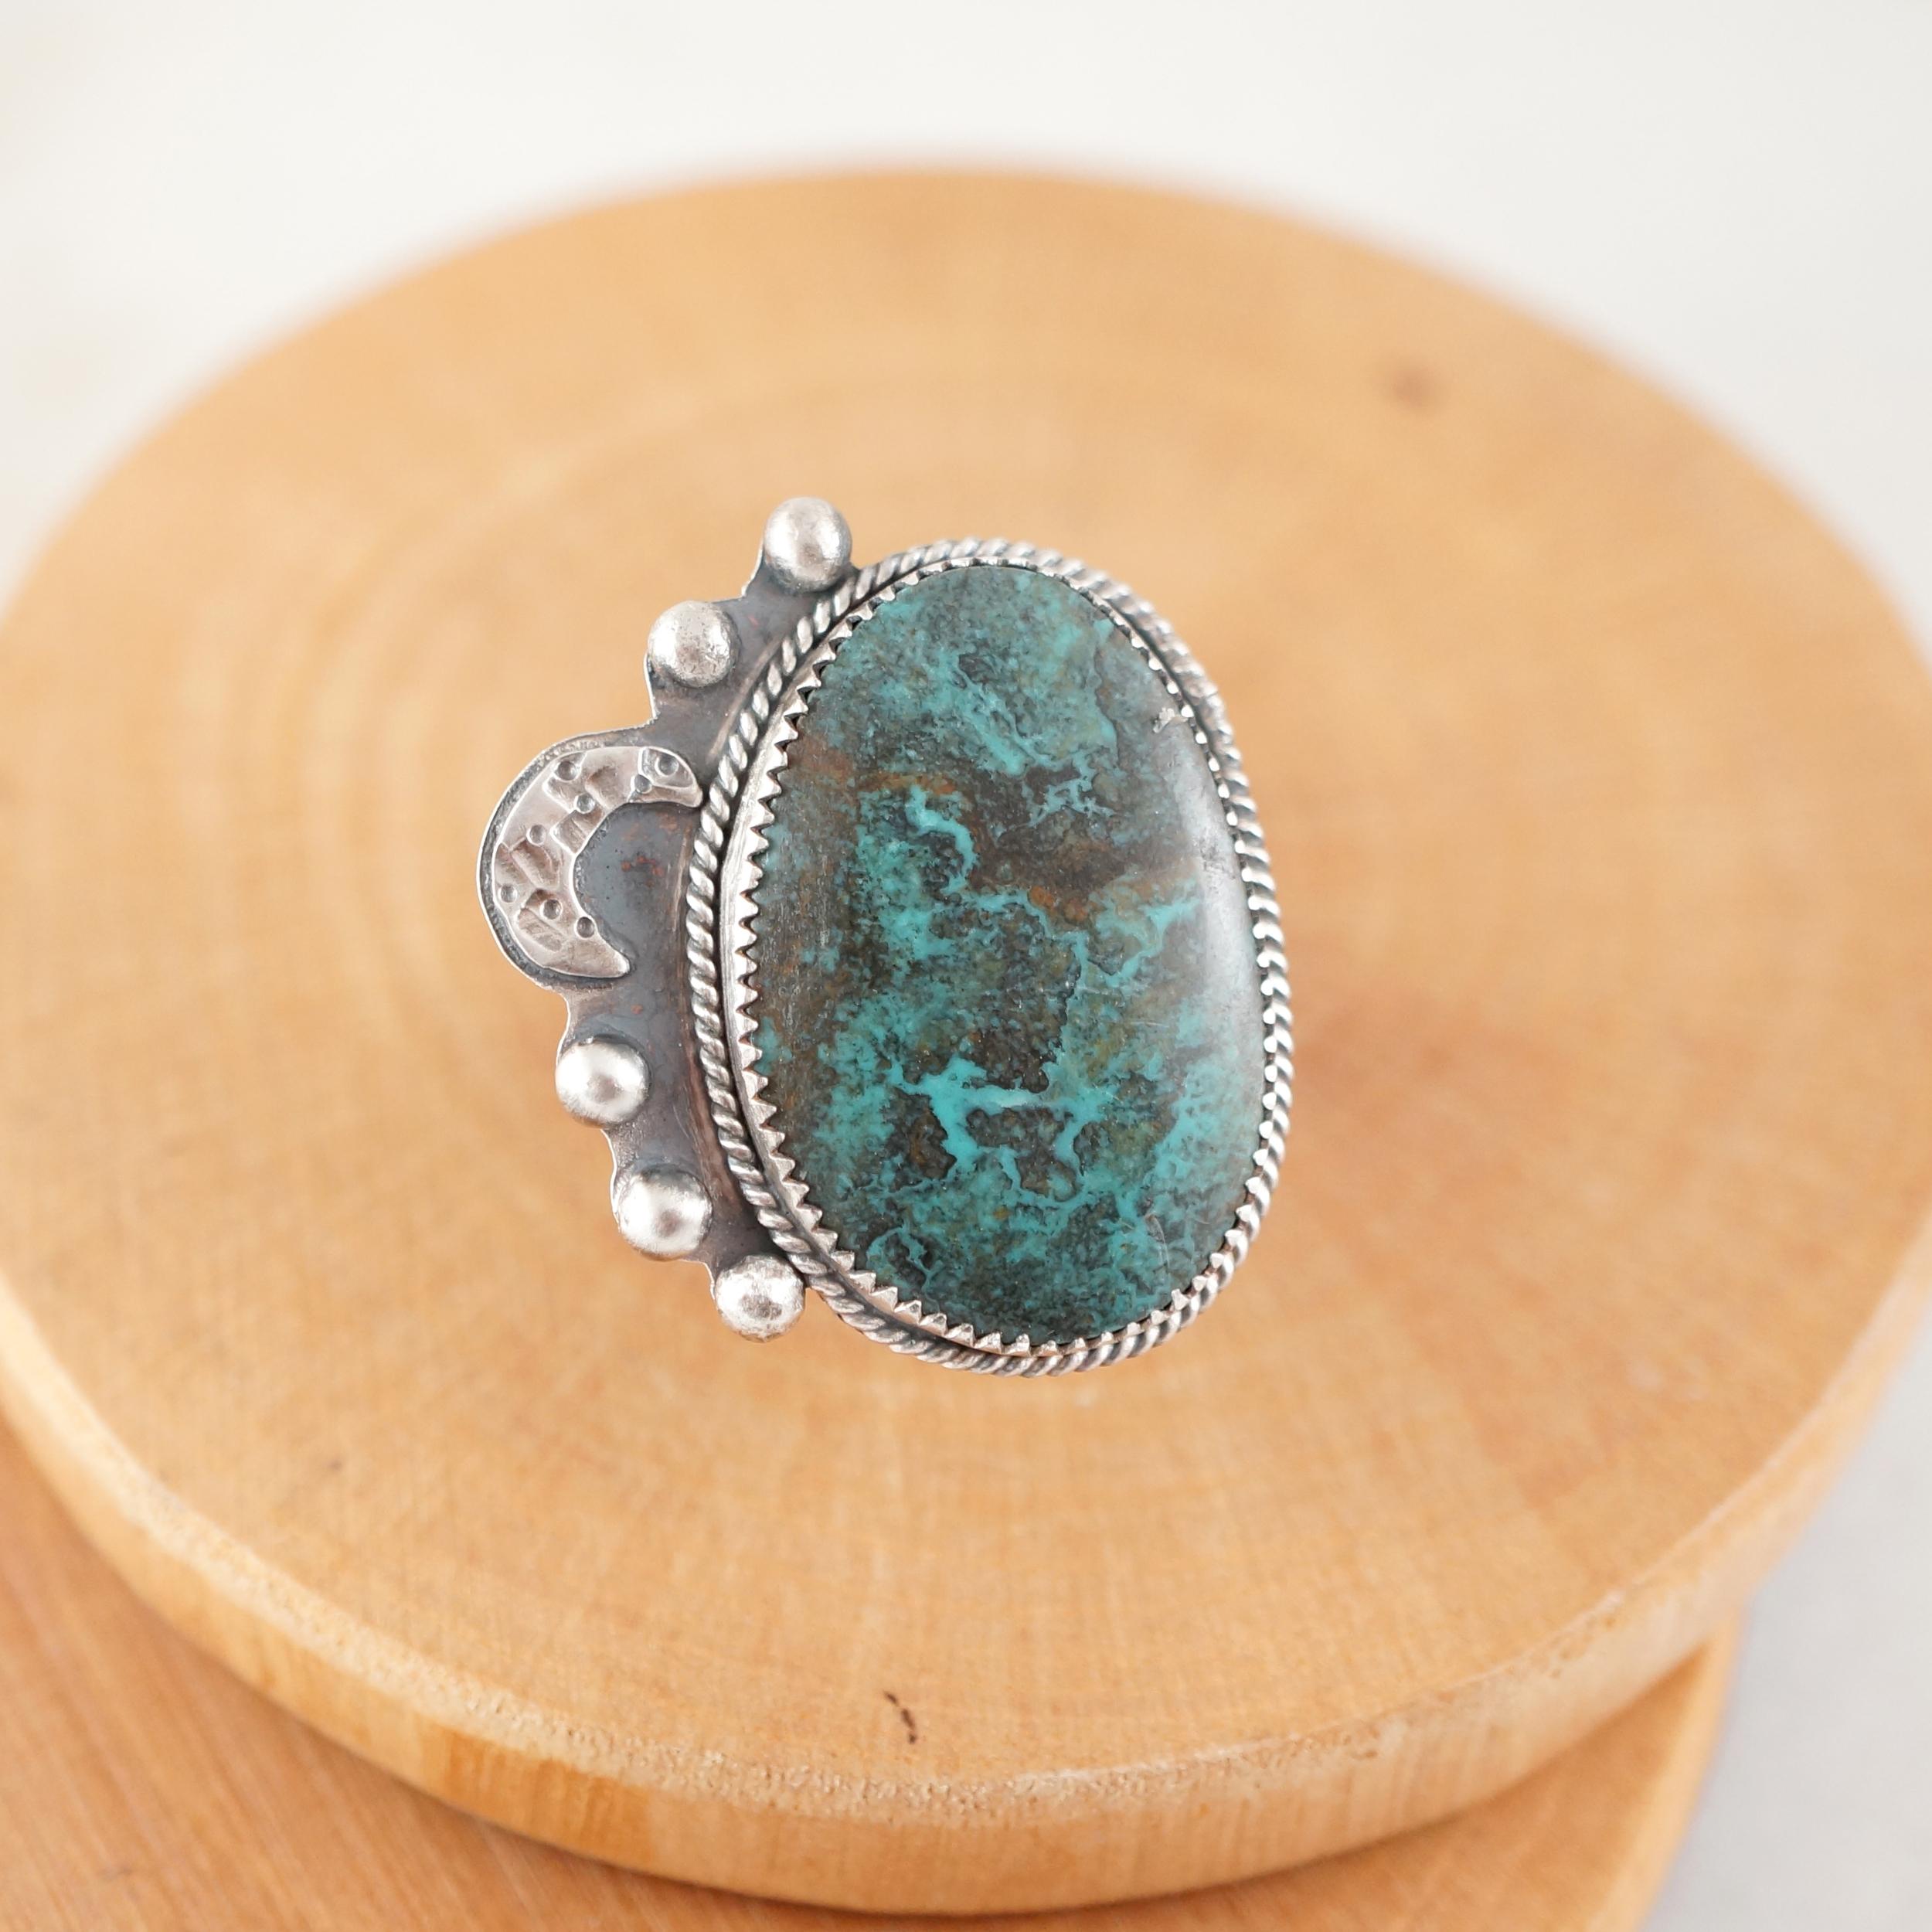 moon_turquoise_ring_1.jpg